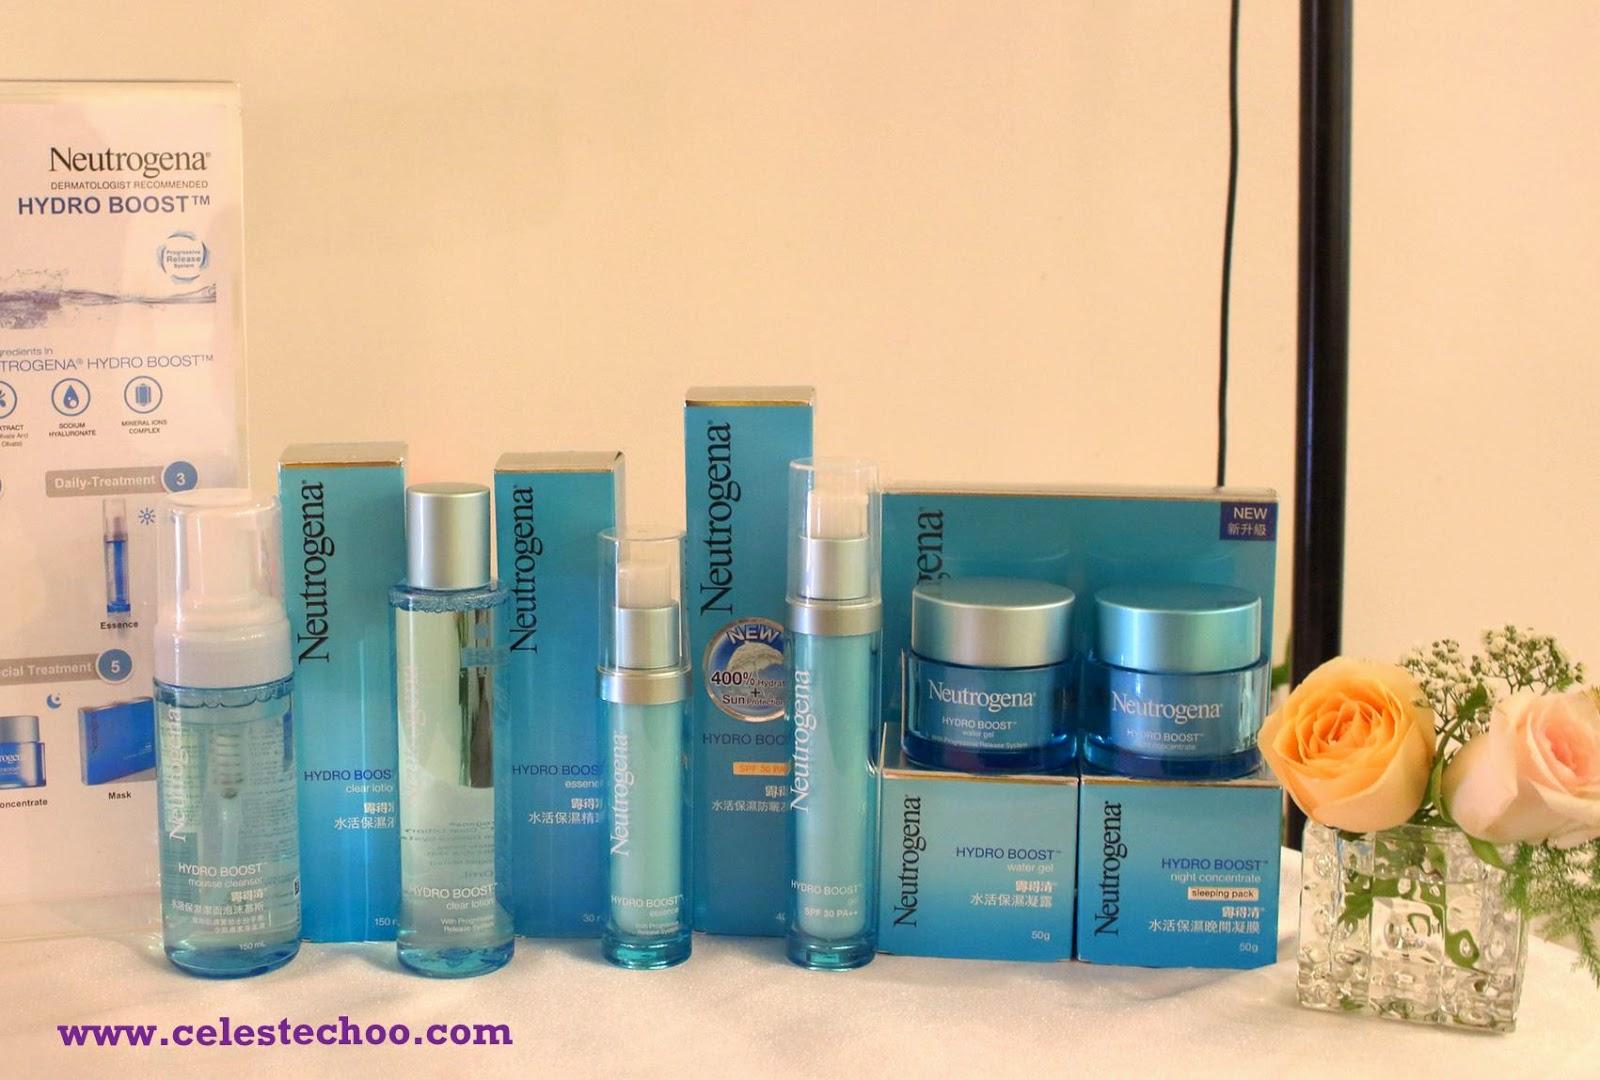 neutrogena_60th_anniversary_hydro_boost_skincare